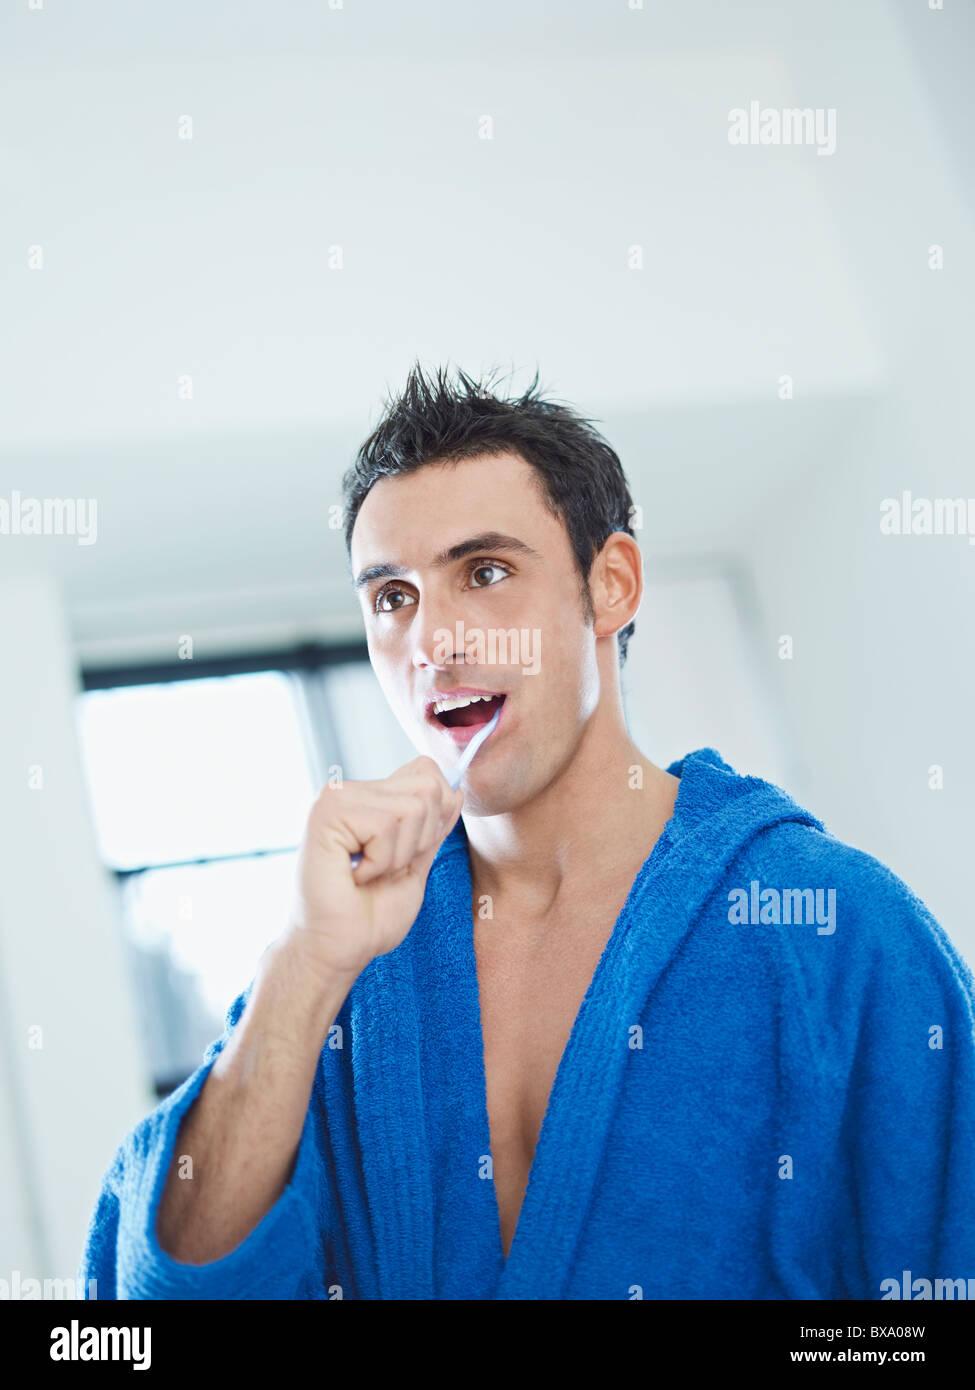 caucasian man brushing teeth in bathrobe - Stock Image